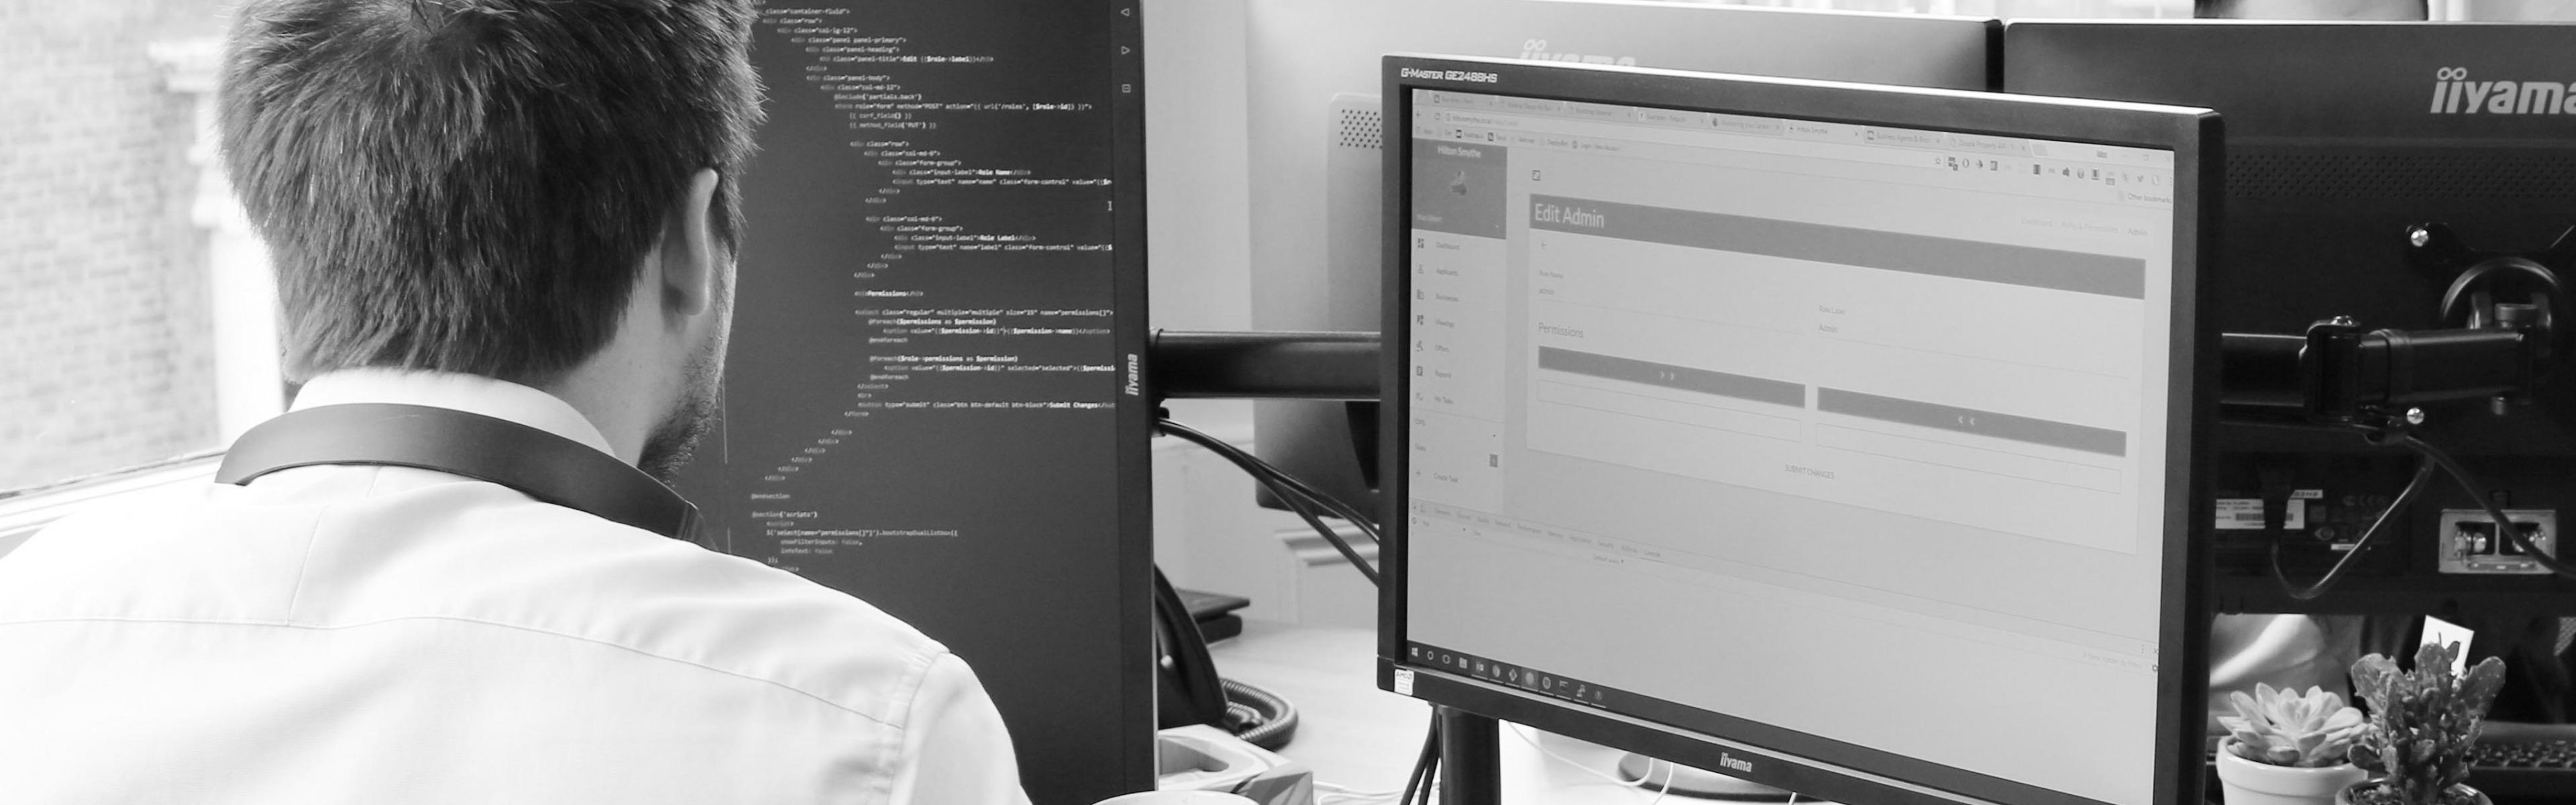 A Blue Wren bespoke software developer working on a bespoke software development project in Blue Wren's HQ in Winckley Square, Preston, Lancashire